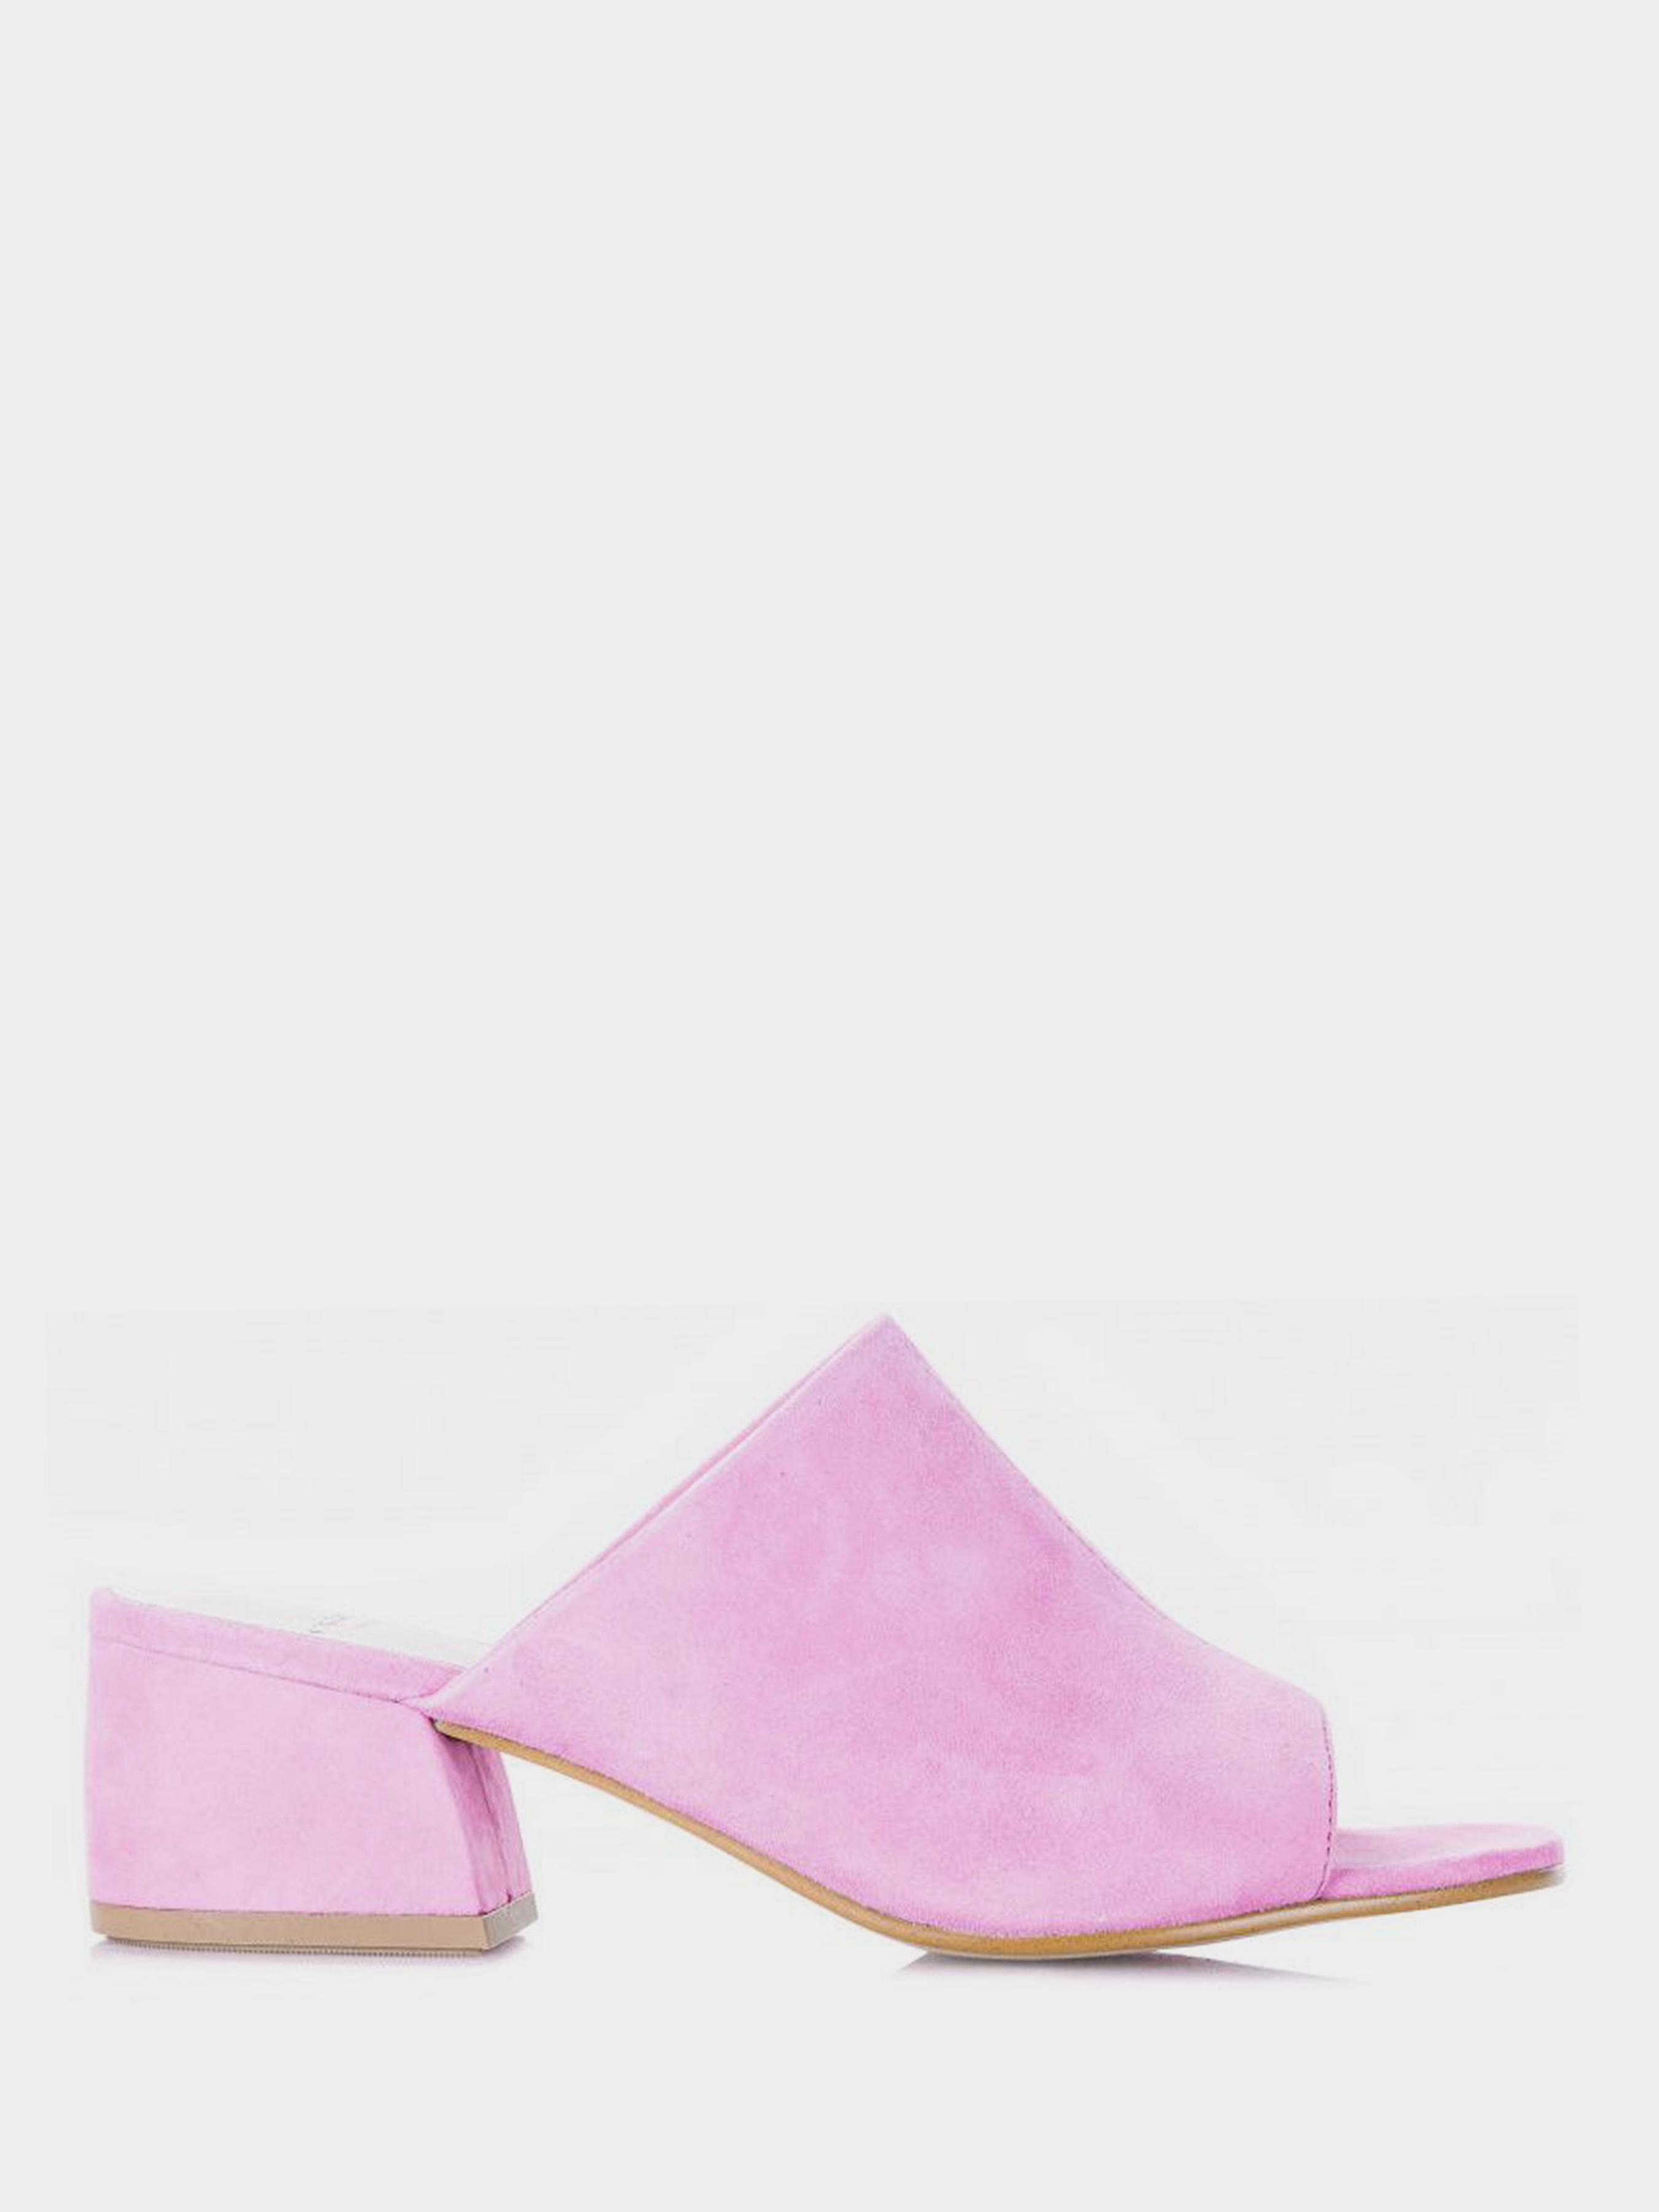 Шлёпанцы женские VAGABOND SAIDE VW5330 модная обувь, 2017